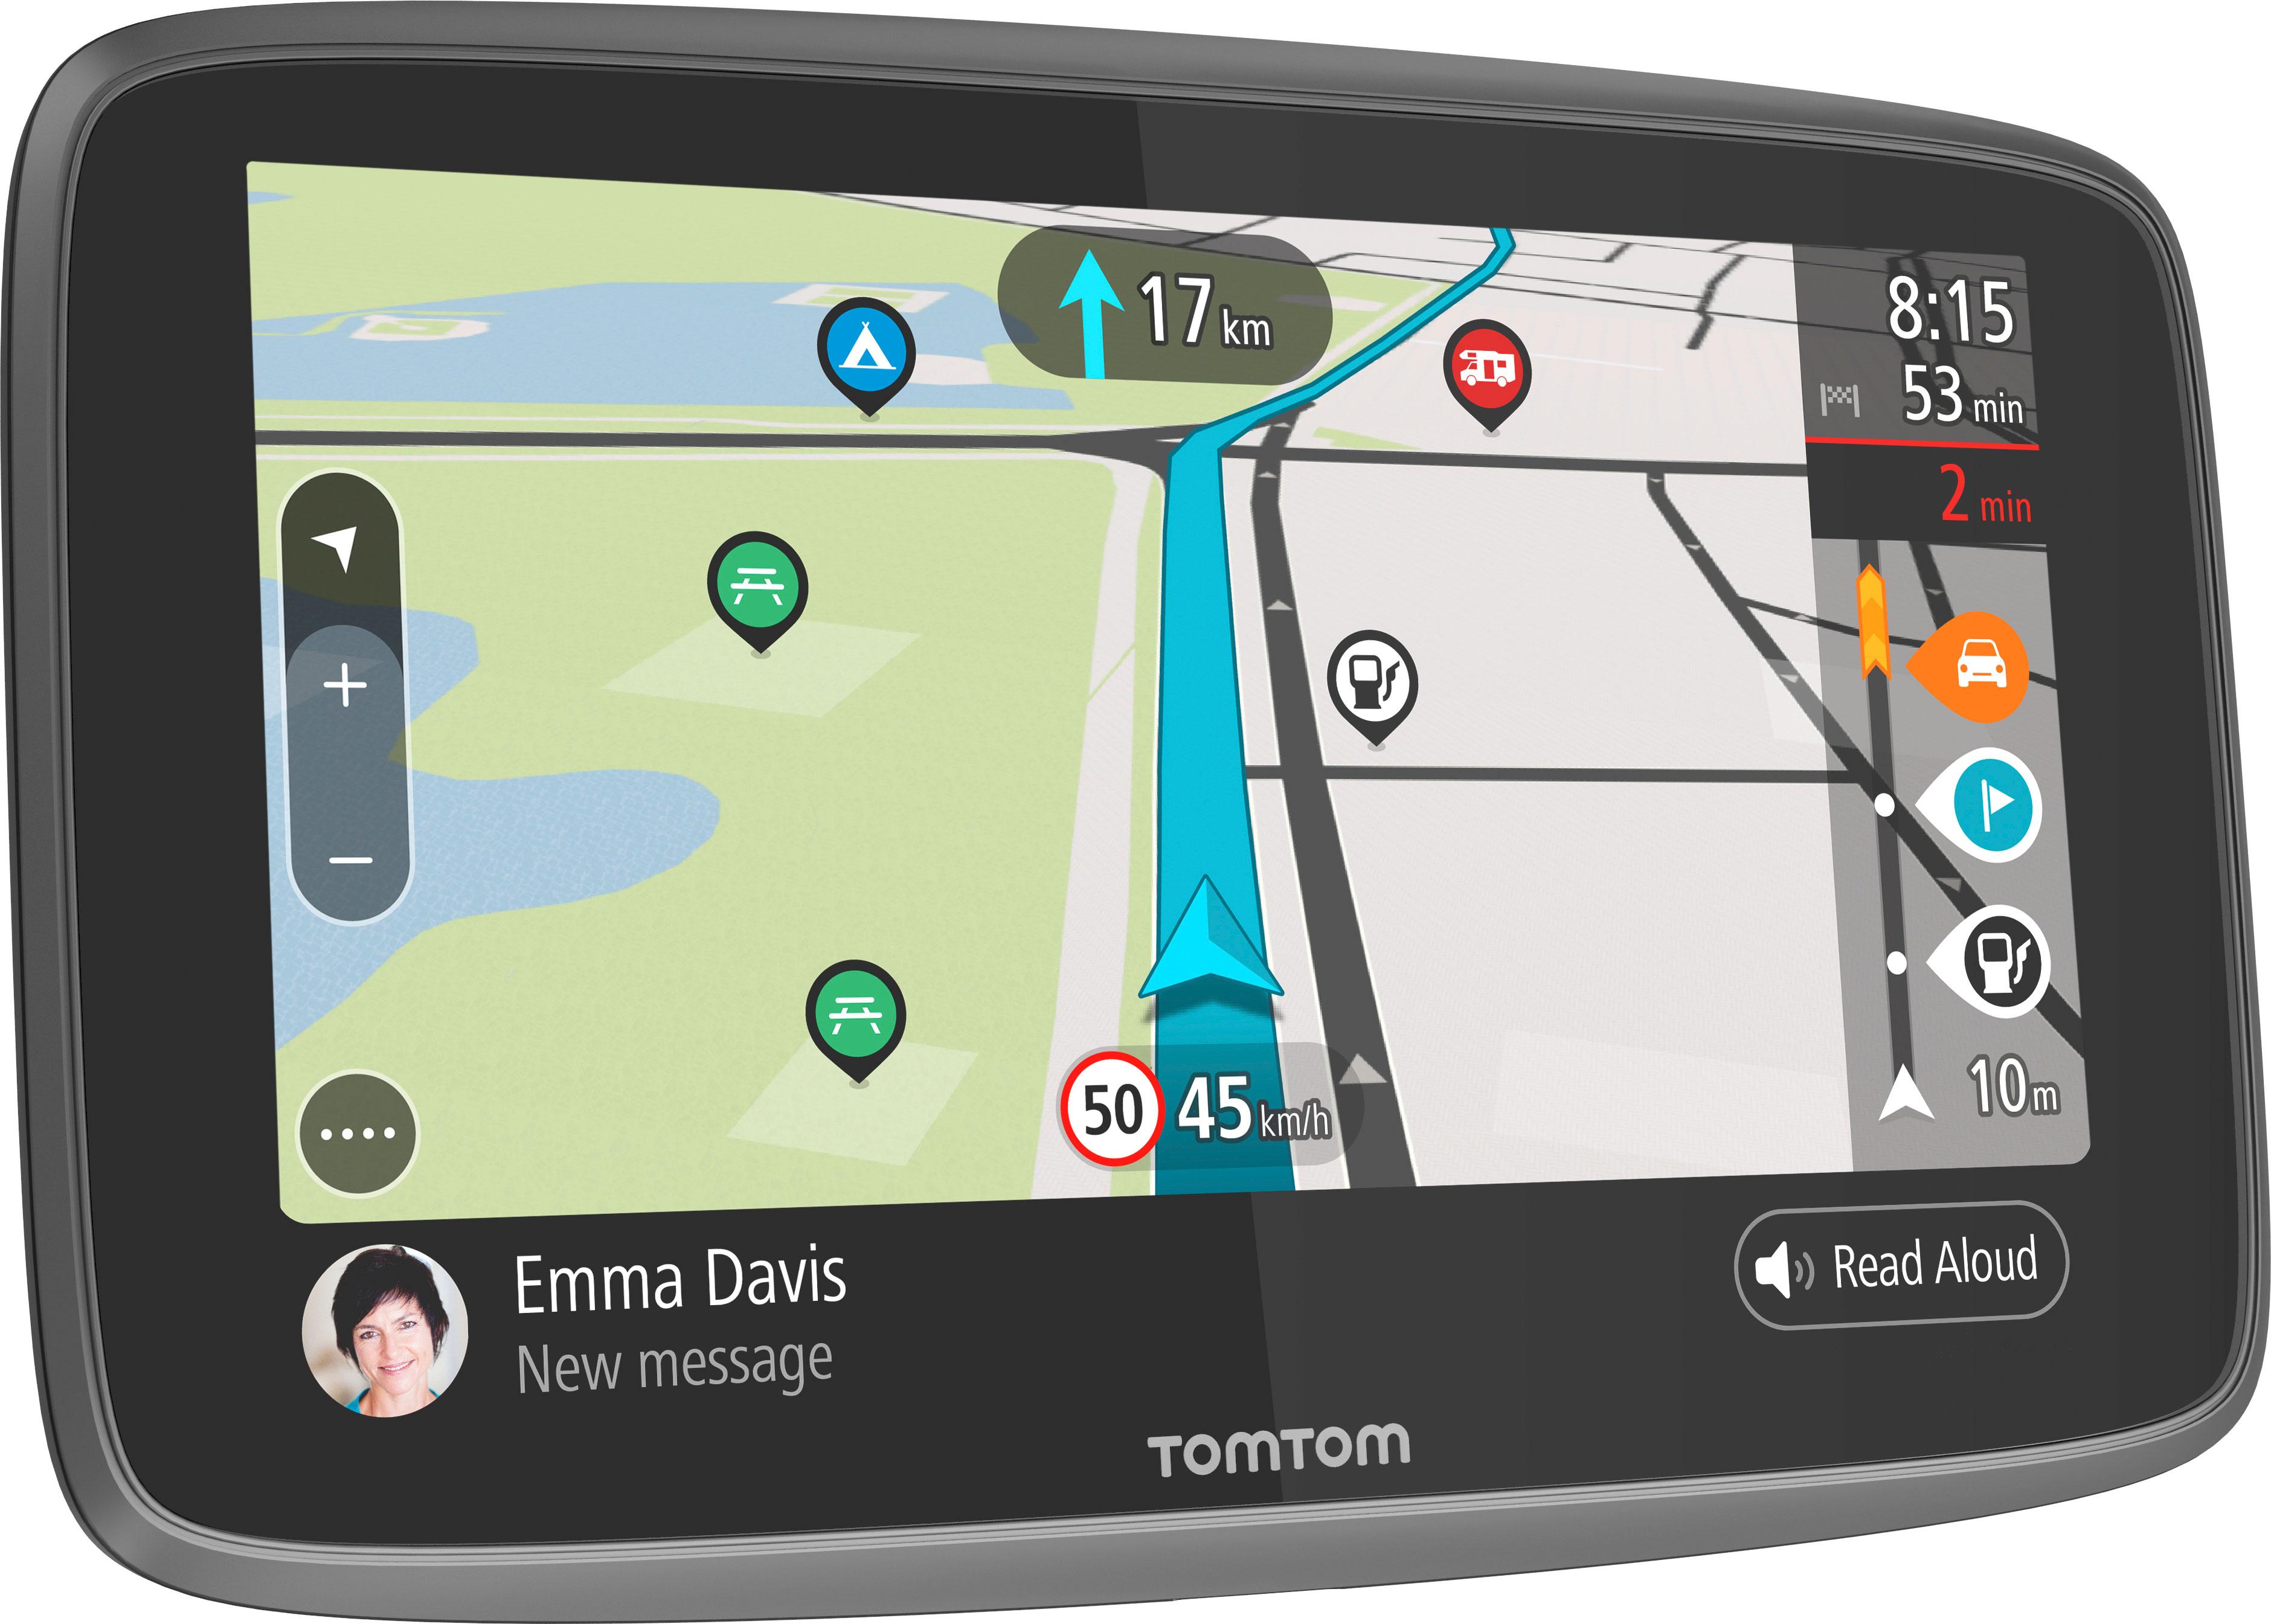 TomTom Go Camper Navigationssystem Preisvergleich